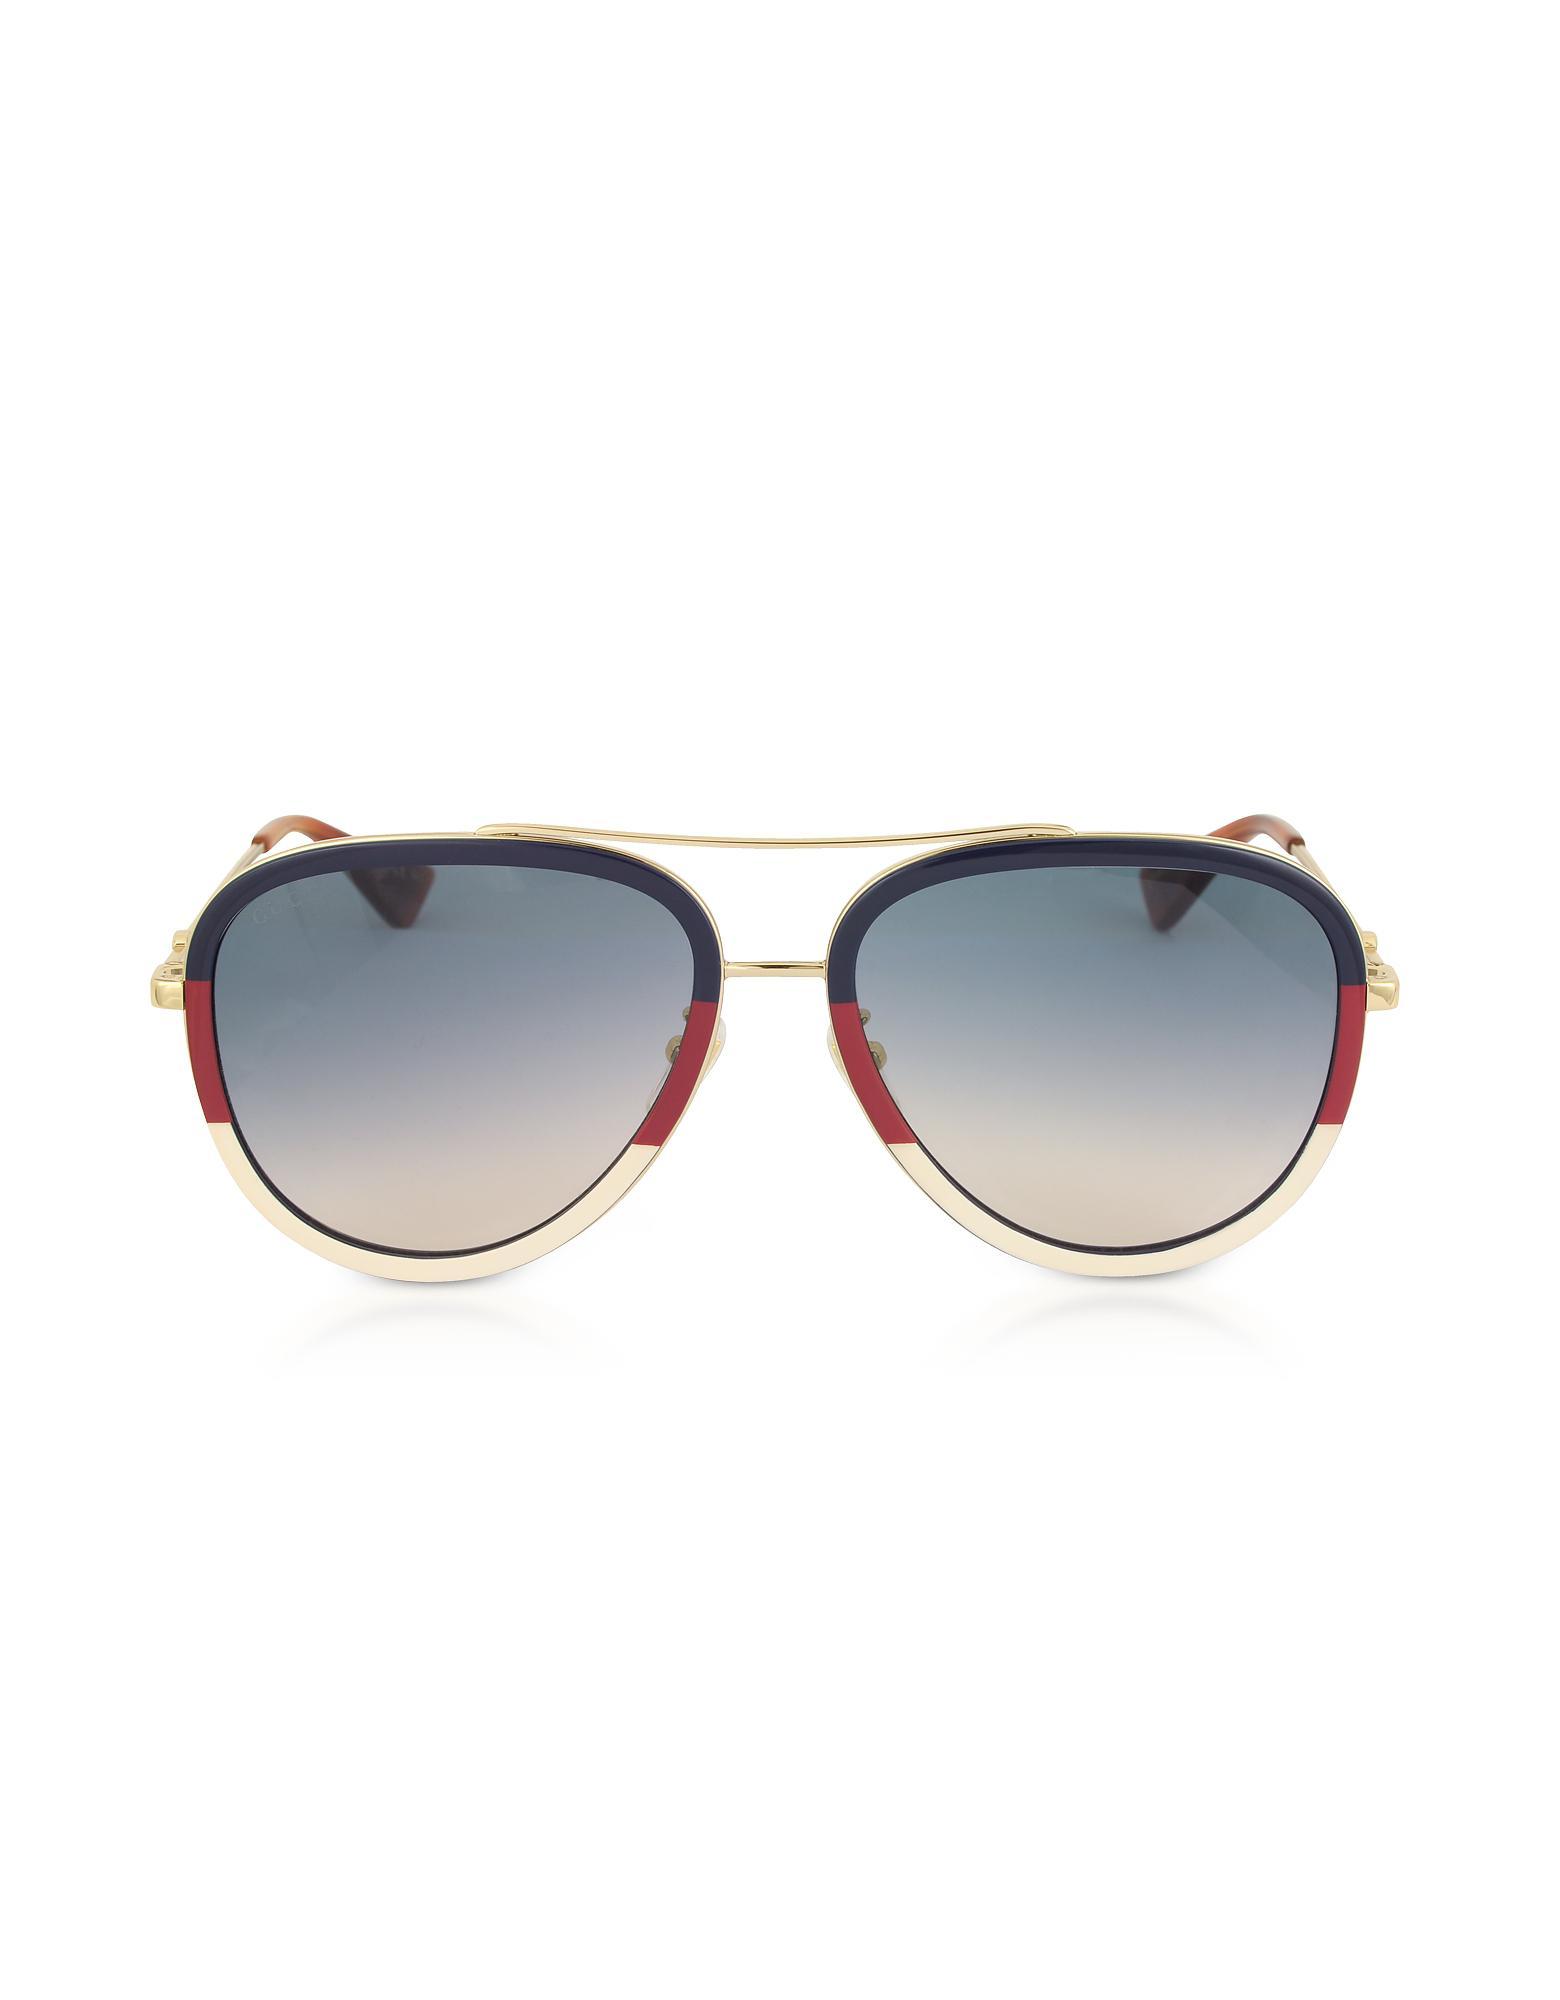 Lyst - Gucci GG0062S Aviator Gold Metal Sunglasses in Metallic for Men 2a8627ac49